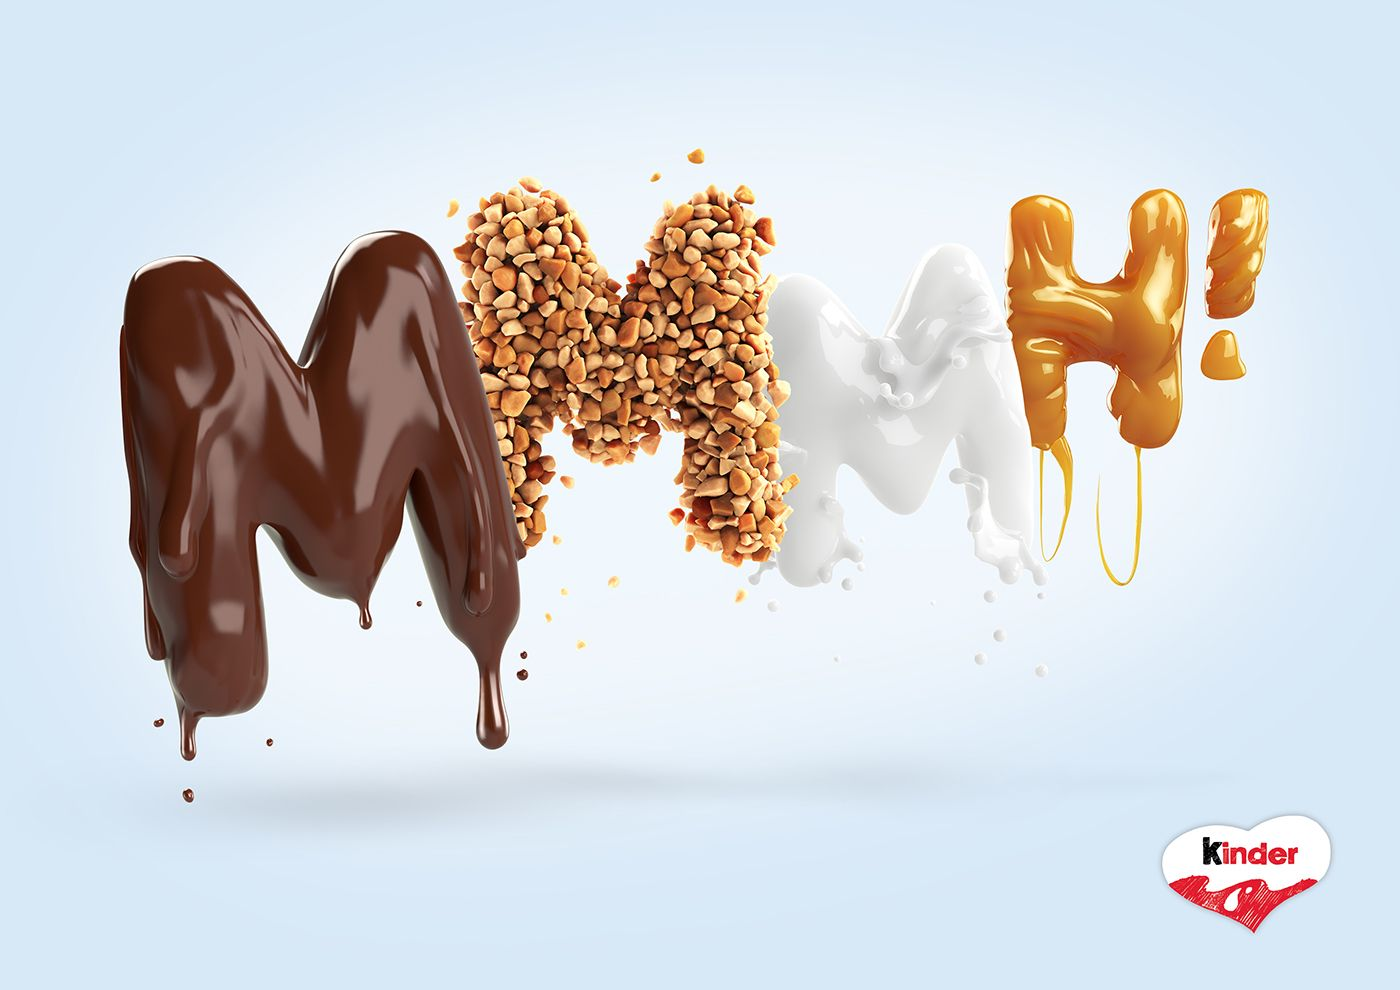 Serial Cut & Analog/Digital for Ferrero on Behance